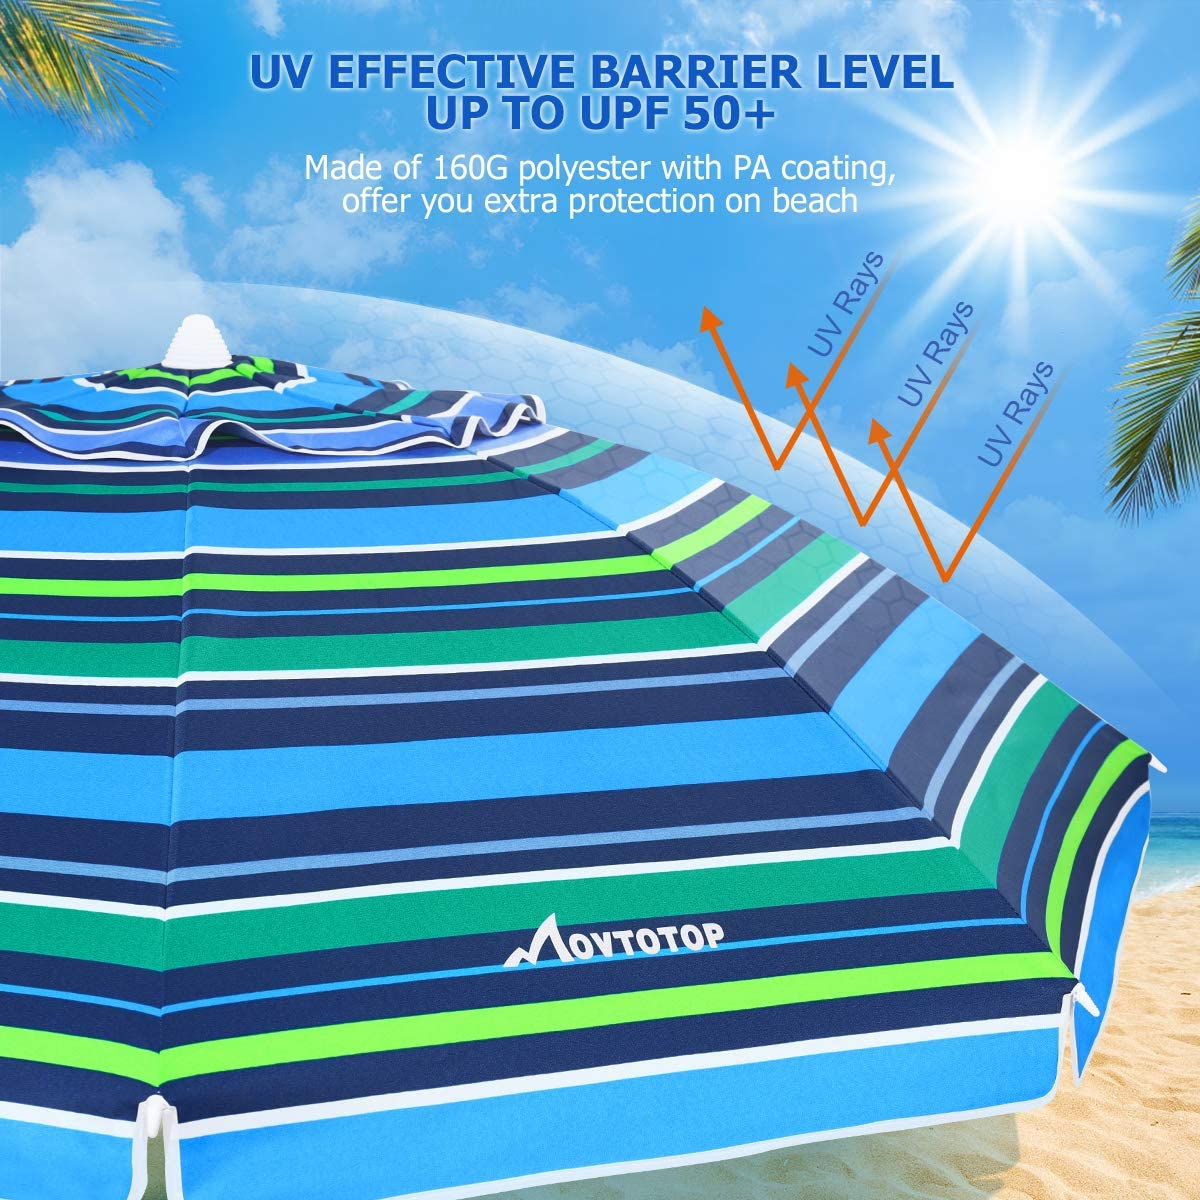 Beach Umbrella, 6.5ft Patio Umbrella with Tilt Mechanism, Portable UV 50+ Protection Beach Umbrella, Blue-Cyan Stripe